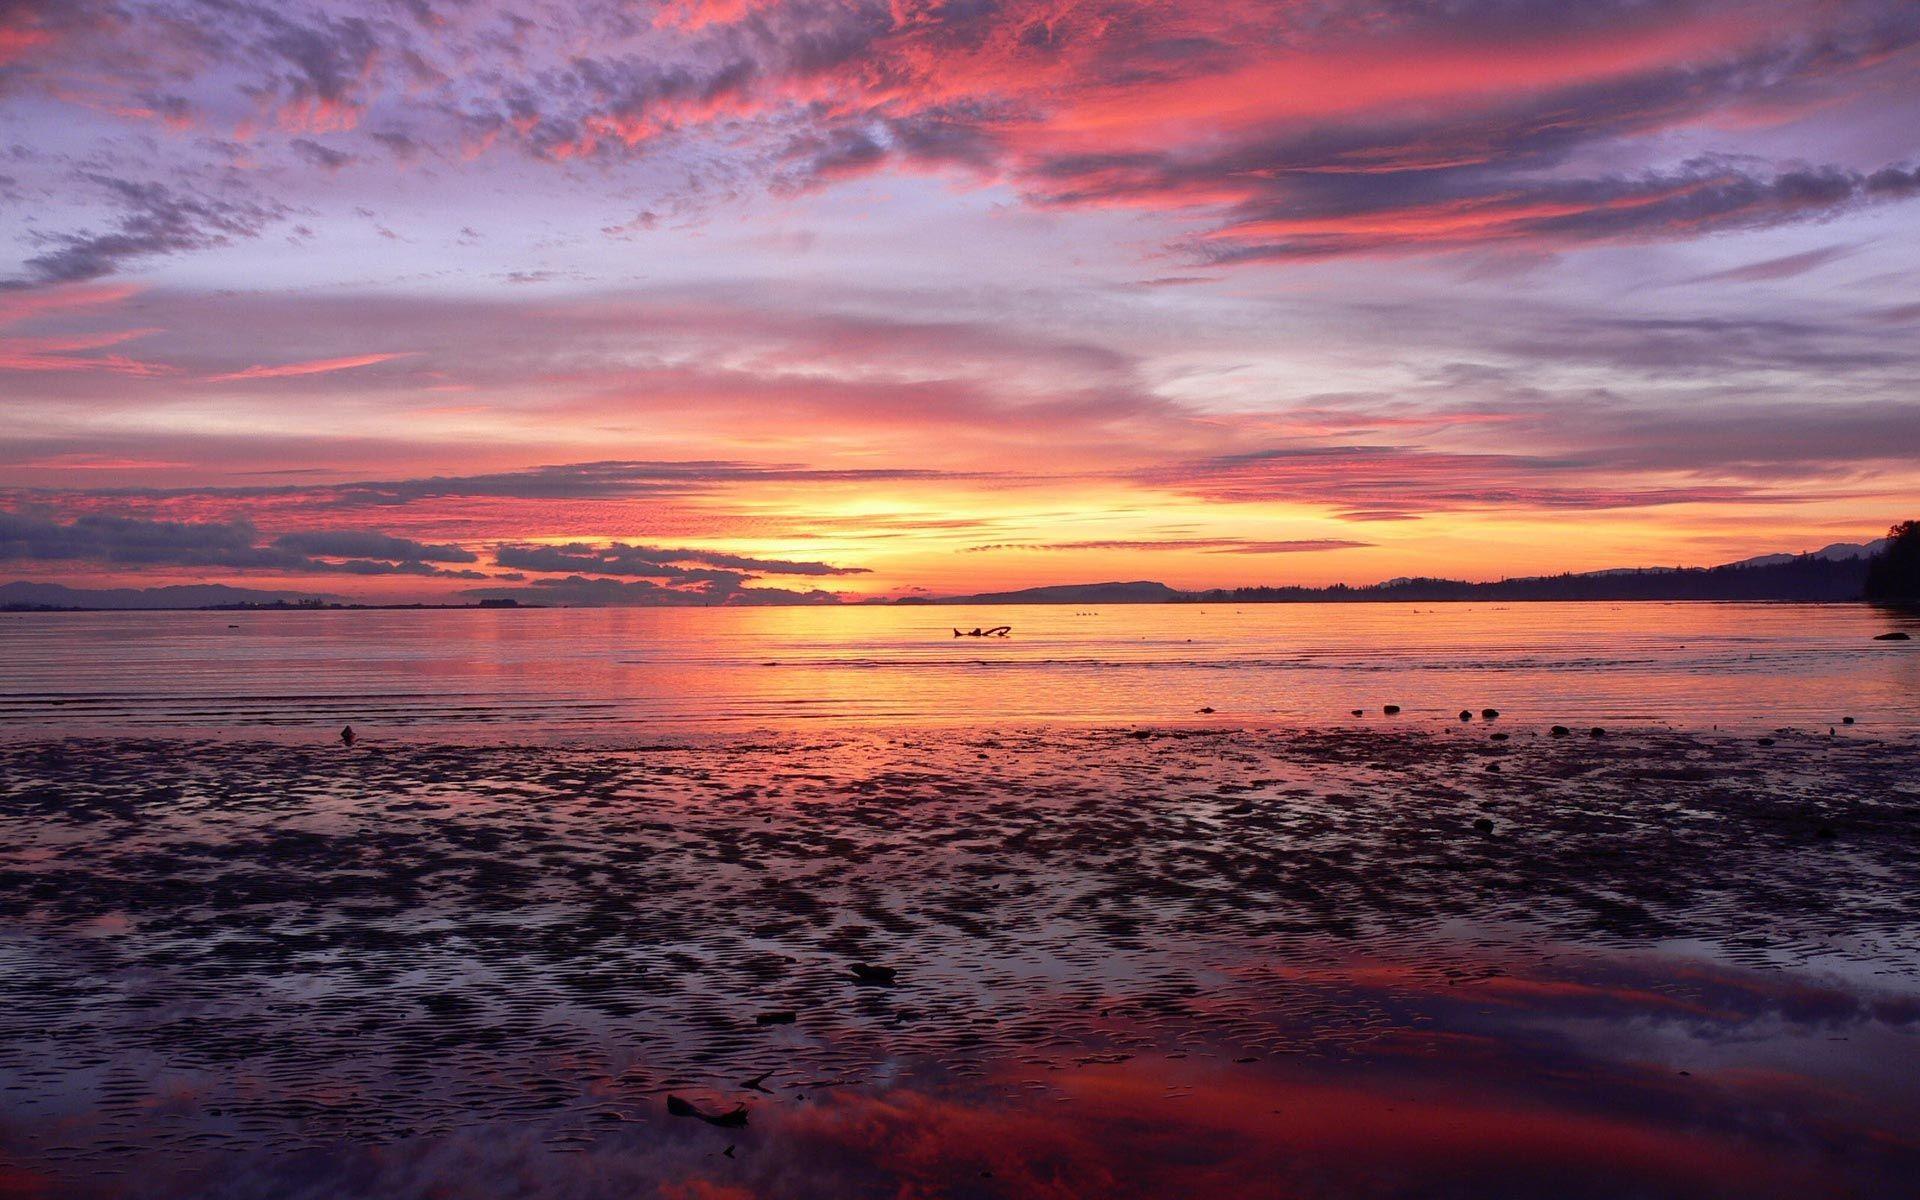 Beach Sunset Background #1